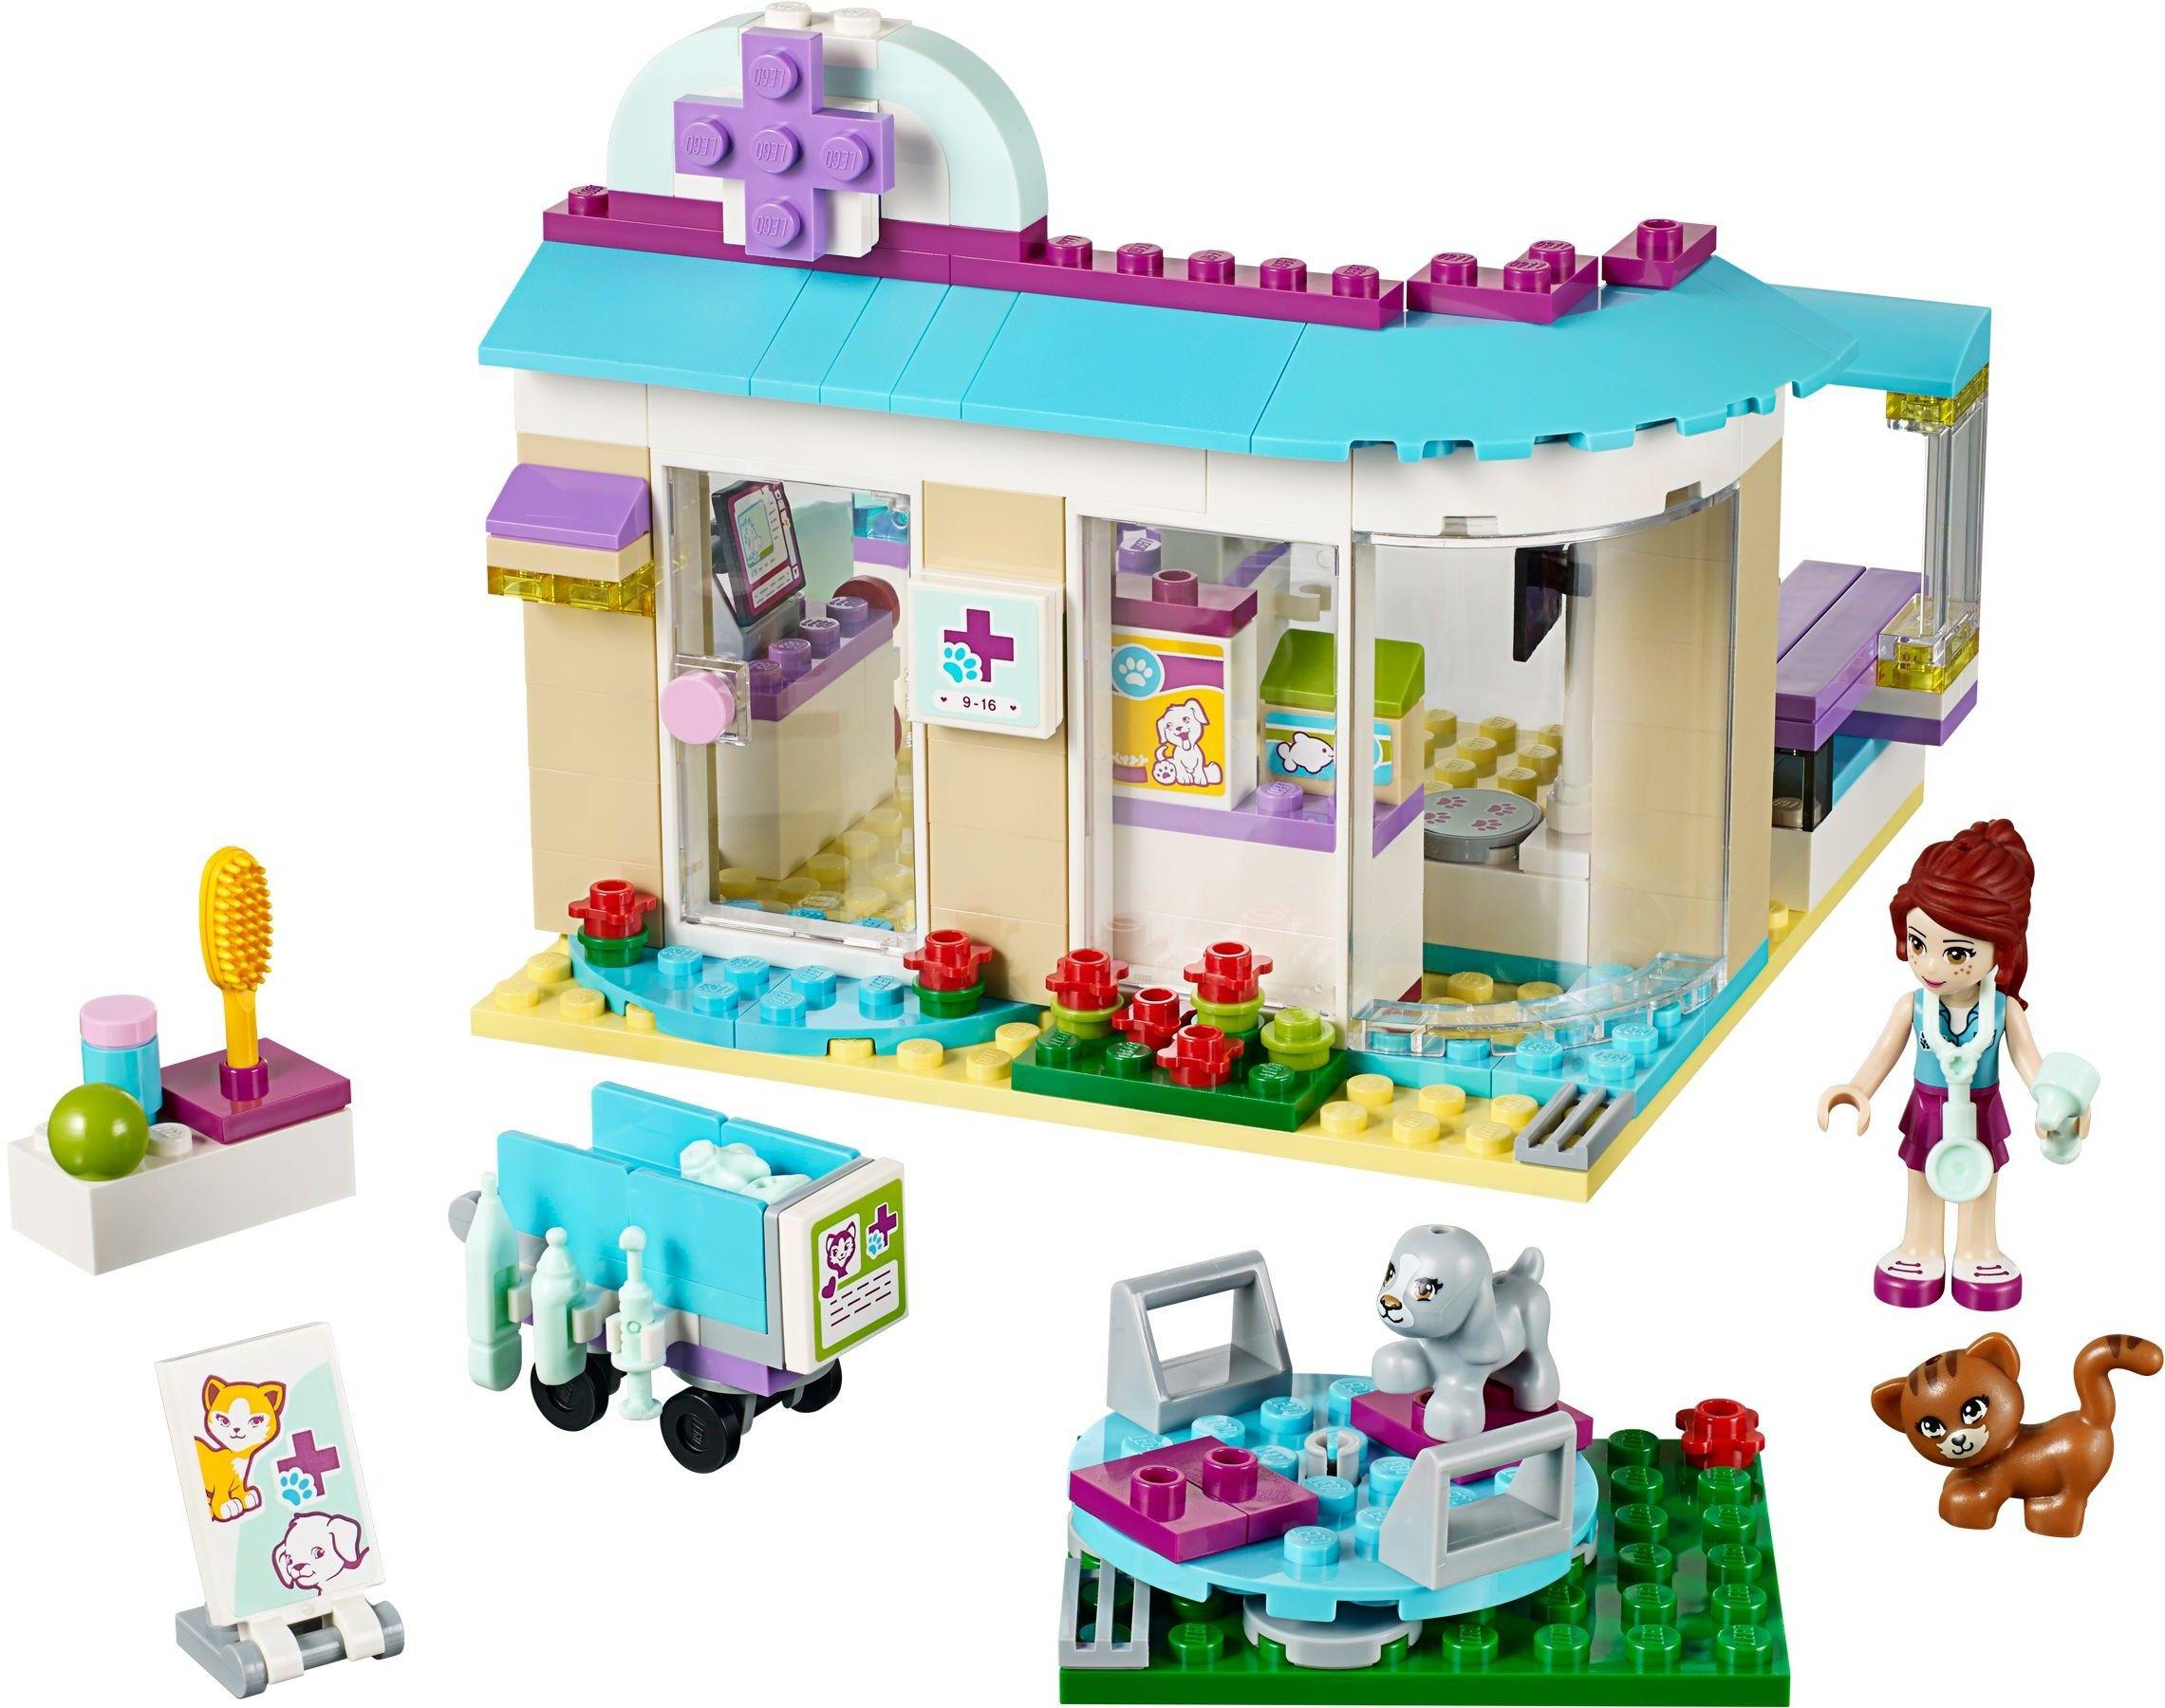 41085 1 Vet Clinic Lego Friends Lego Friends Sets Lego Animals